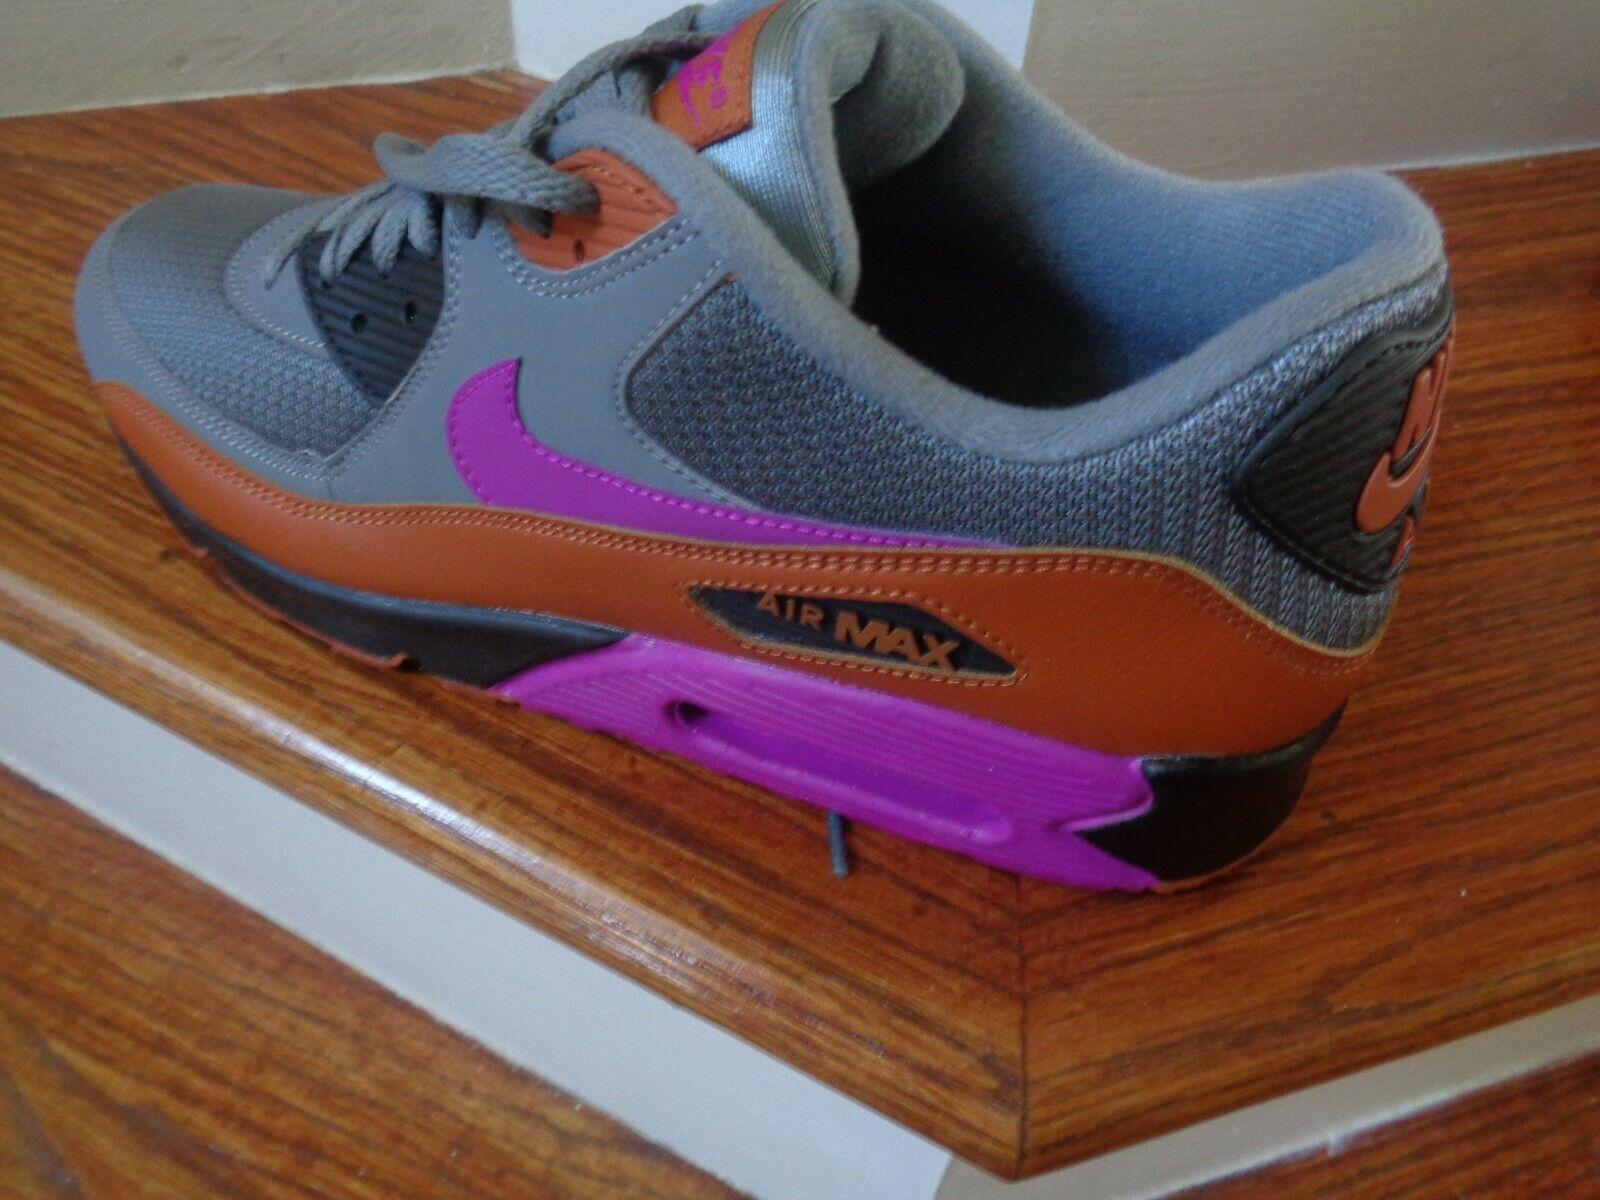 Mens Womens Winter Shoes Nike Air Max 97 PRM Bright Citron